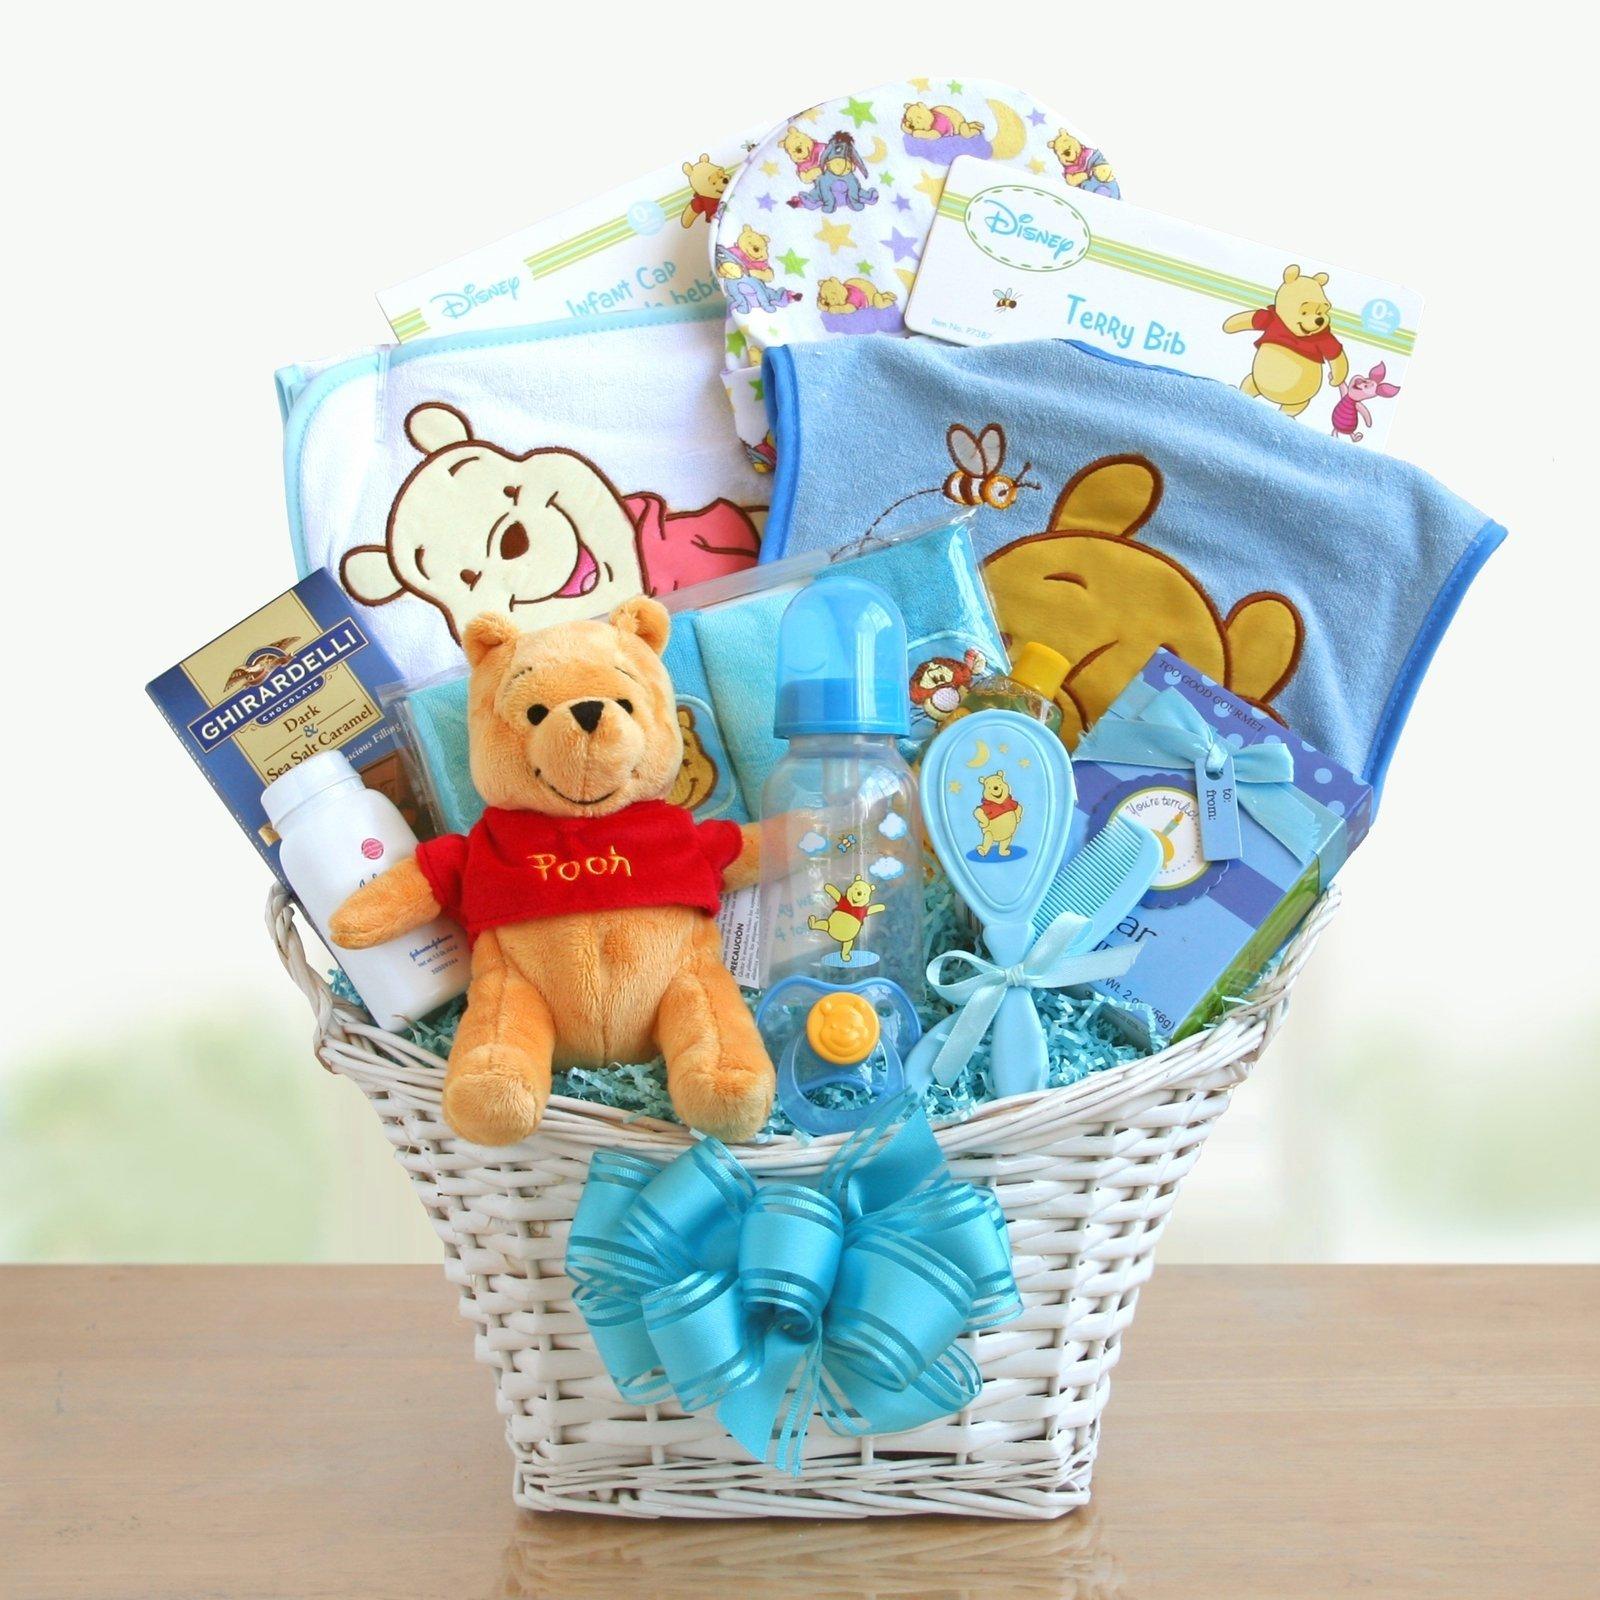 10 Most Popular Baby Boy Gift Basket Ideas winnie the pooh baby boy gift basket hayneedle 2020